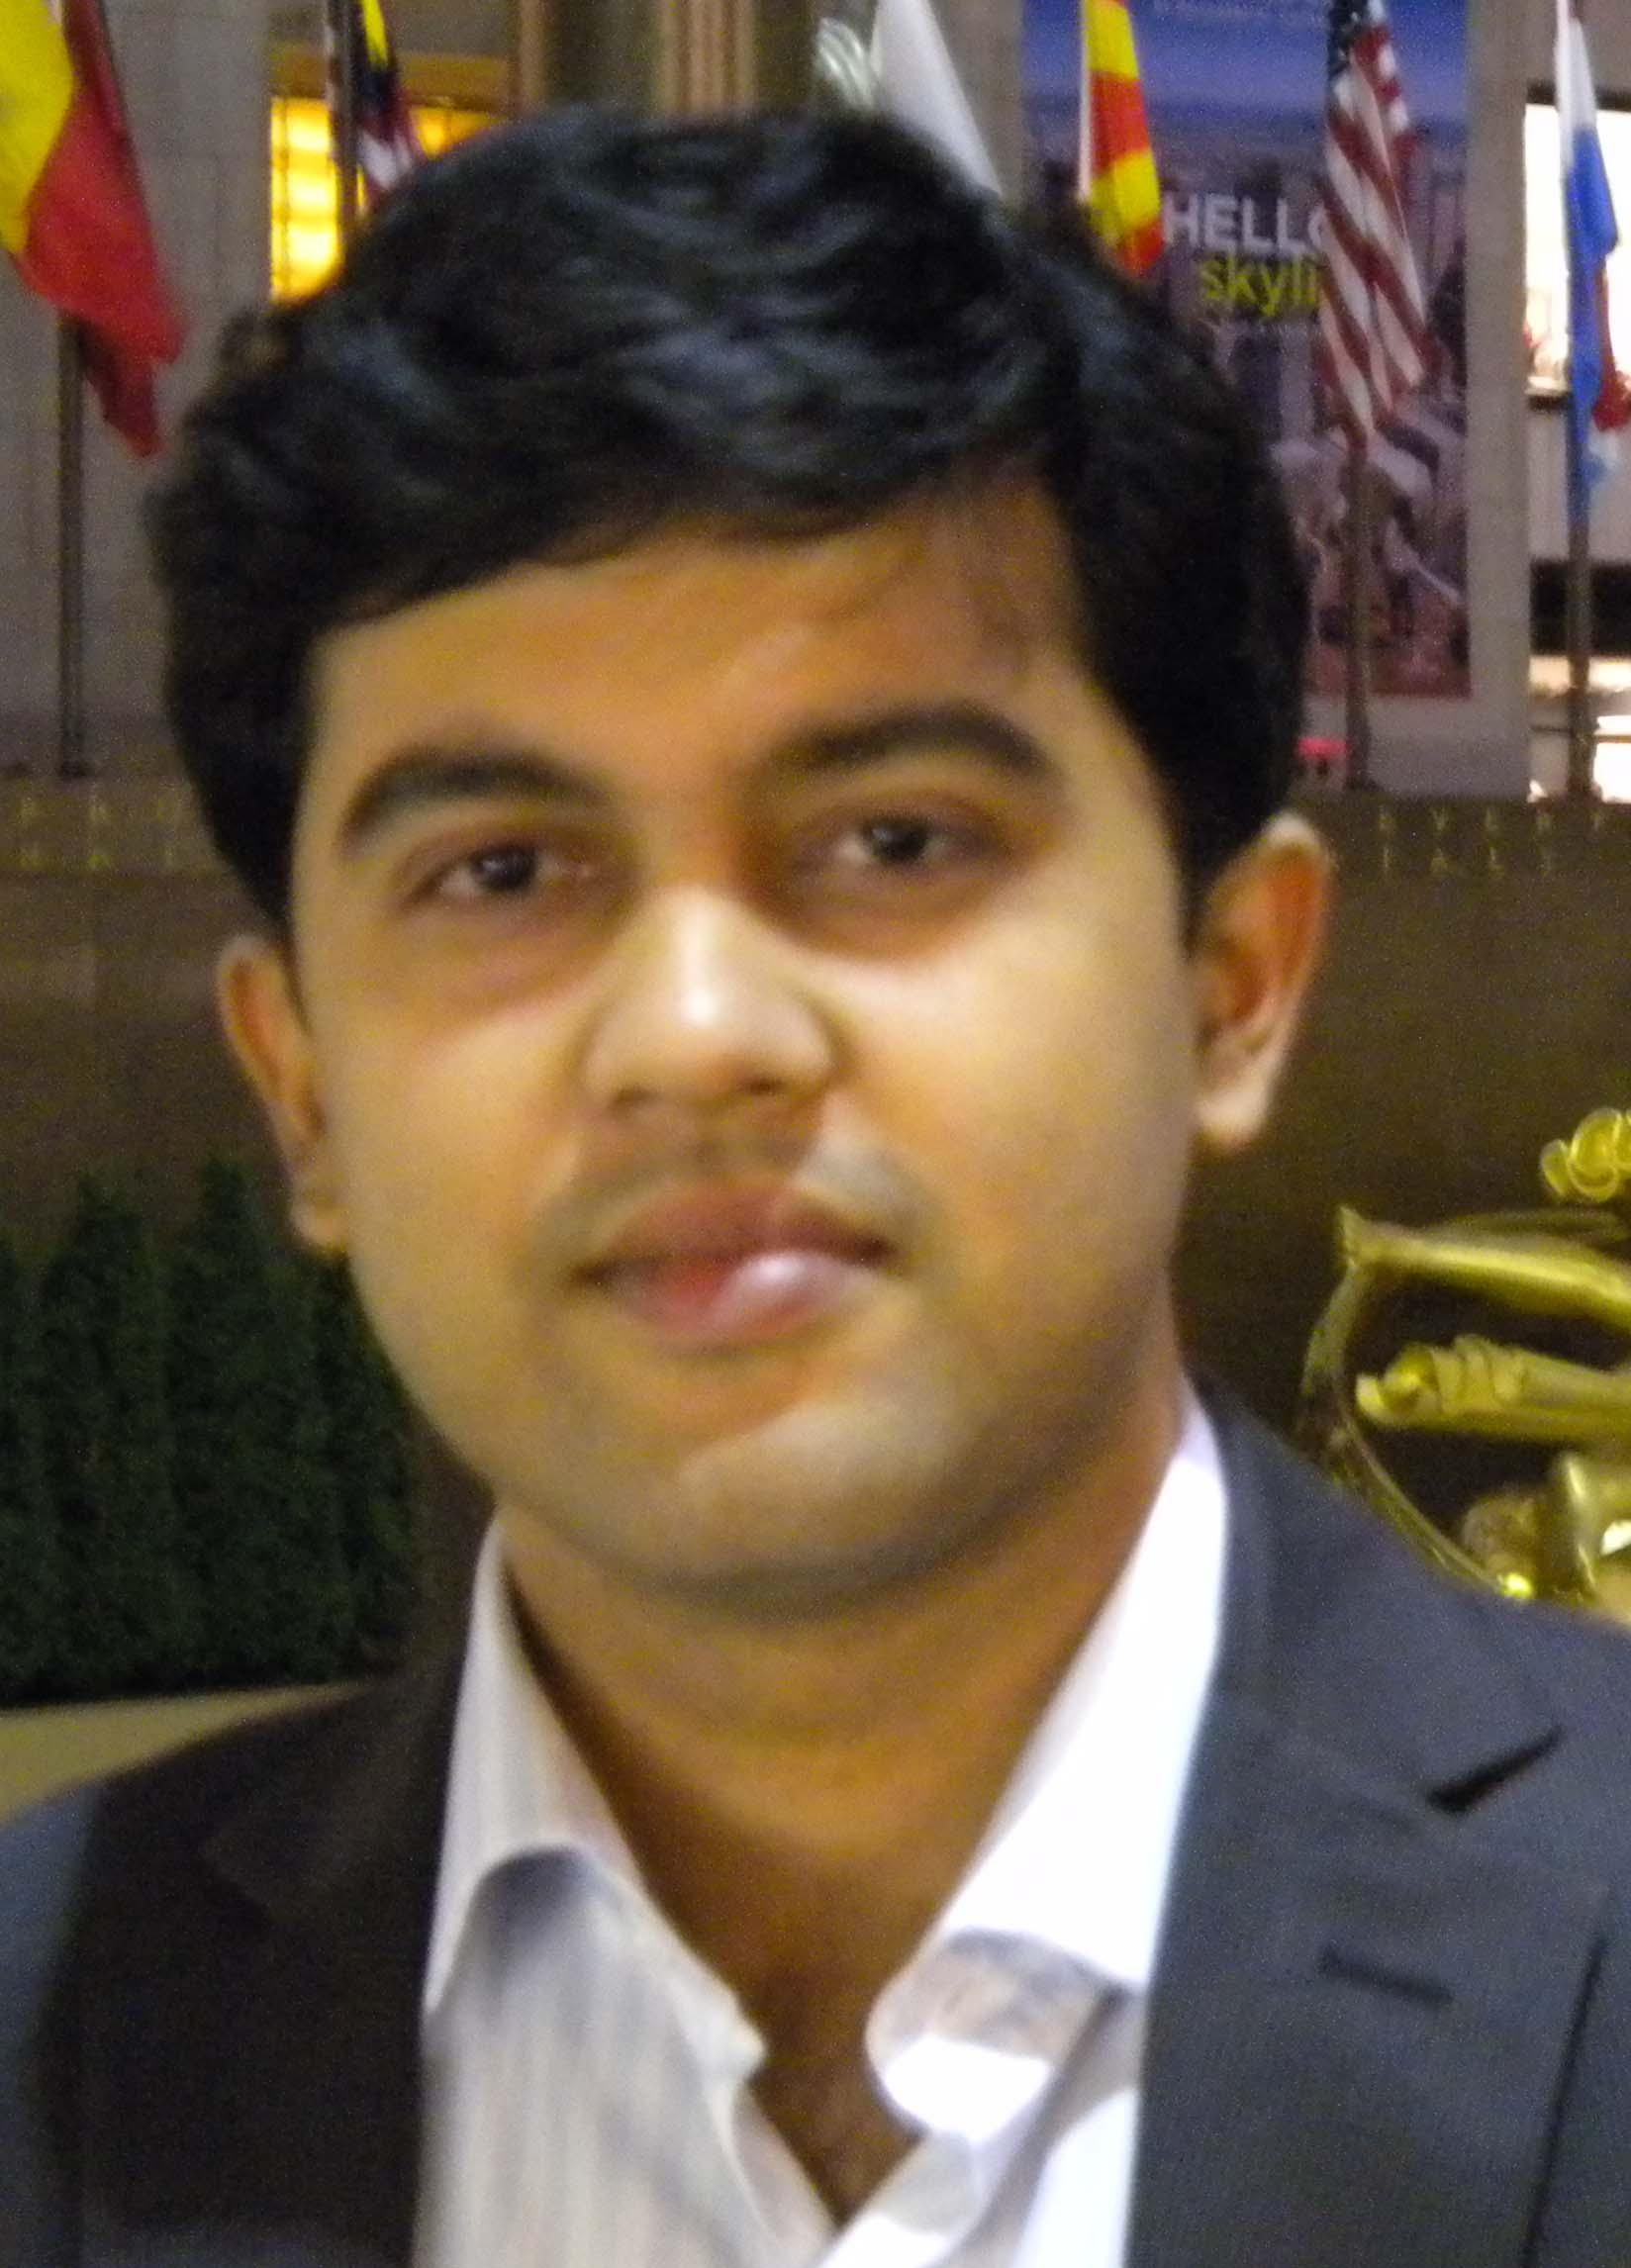 Sumit Maniyar, CFA, Co-Founder, Function Space